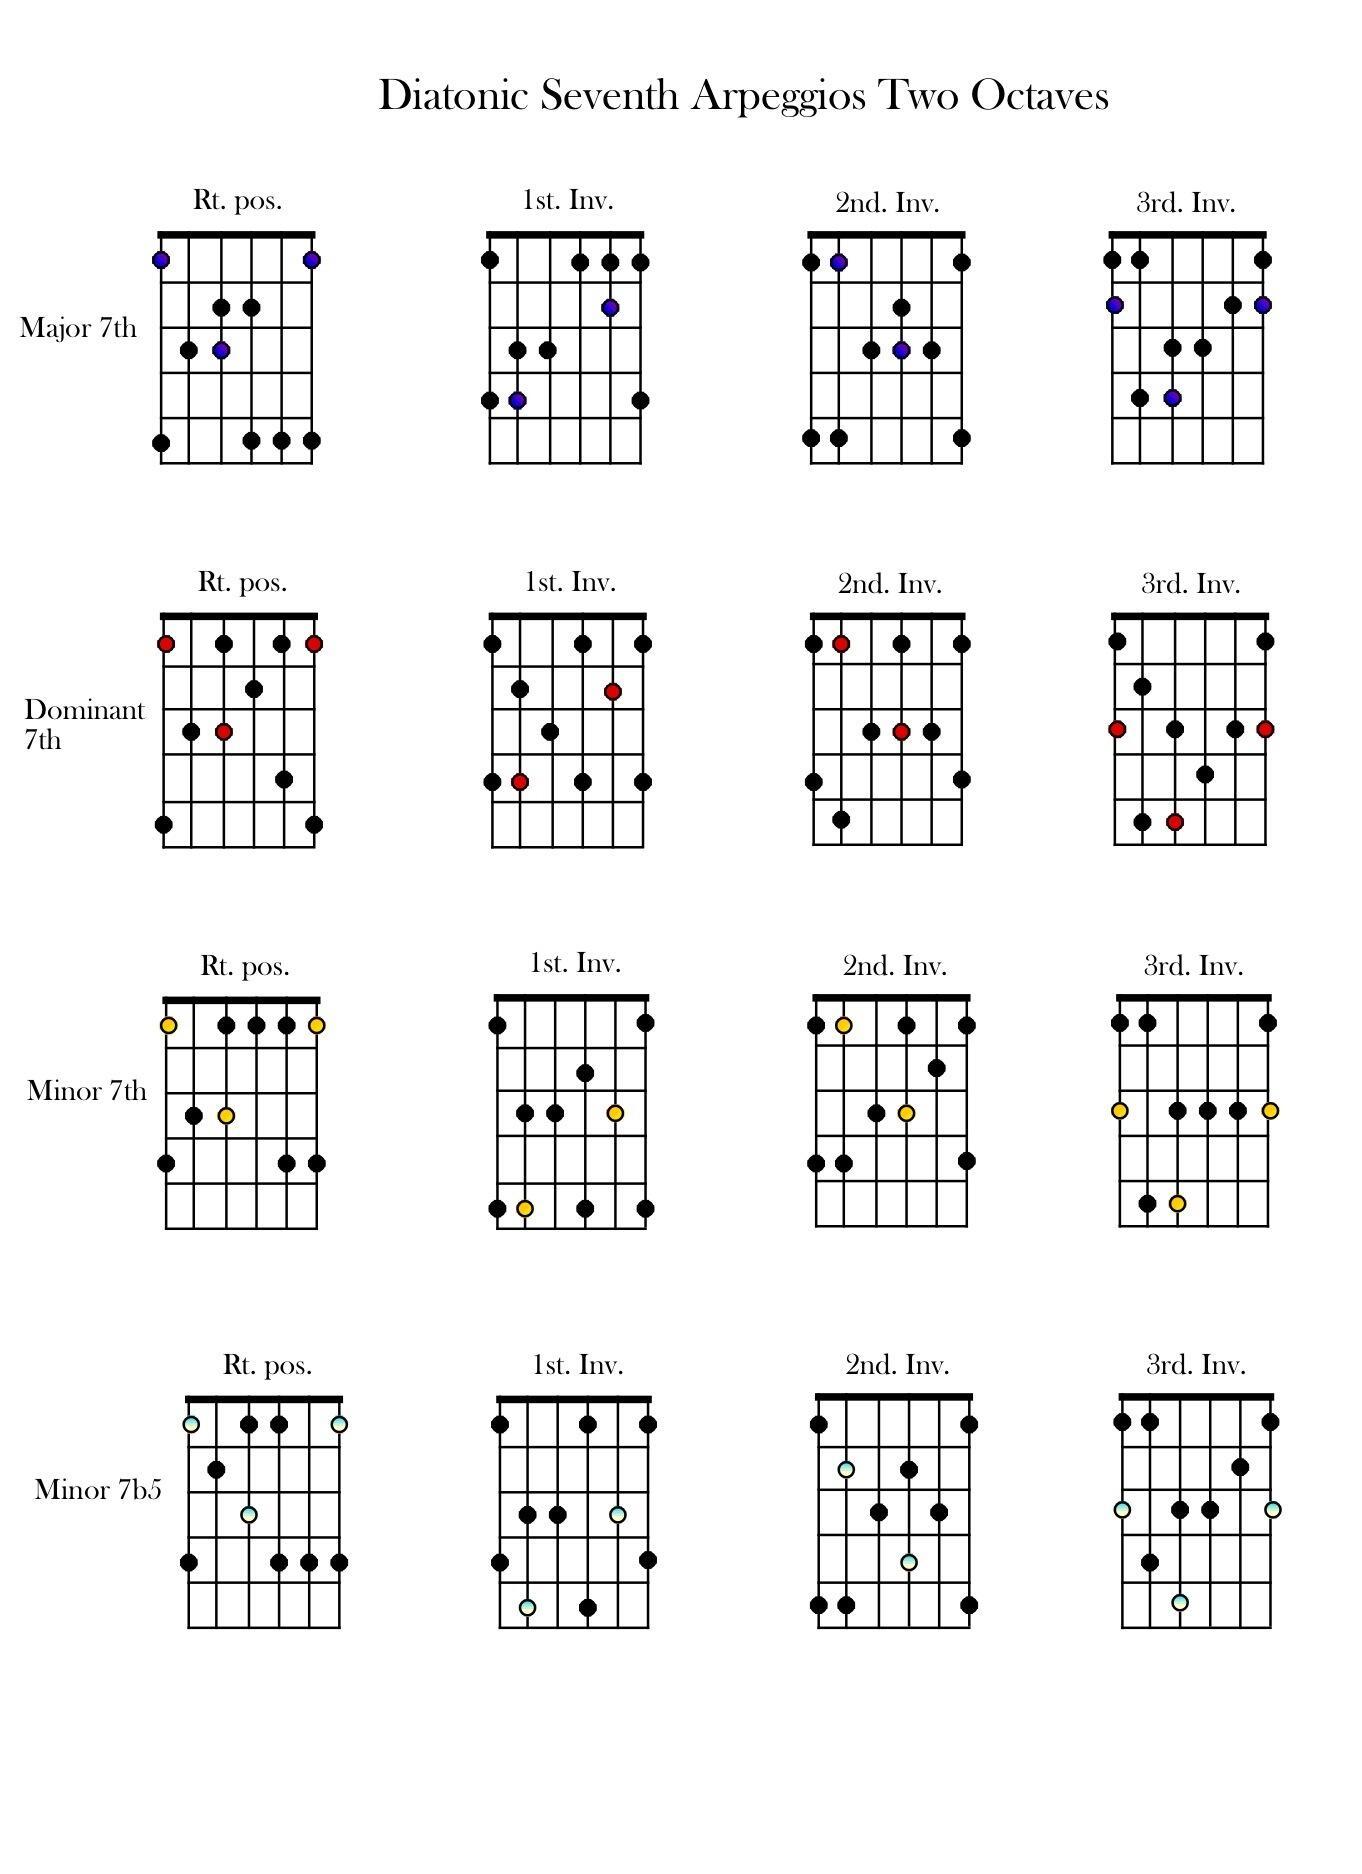 Arpeggios, 2 octaves http://t.co/myKsE05jOI